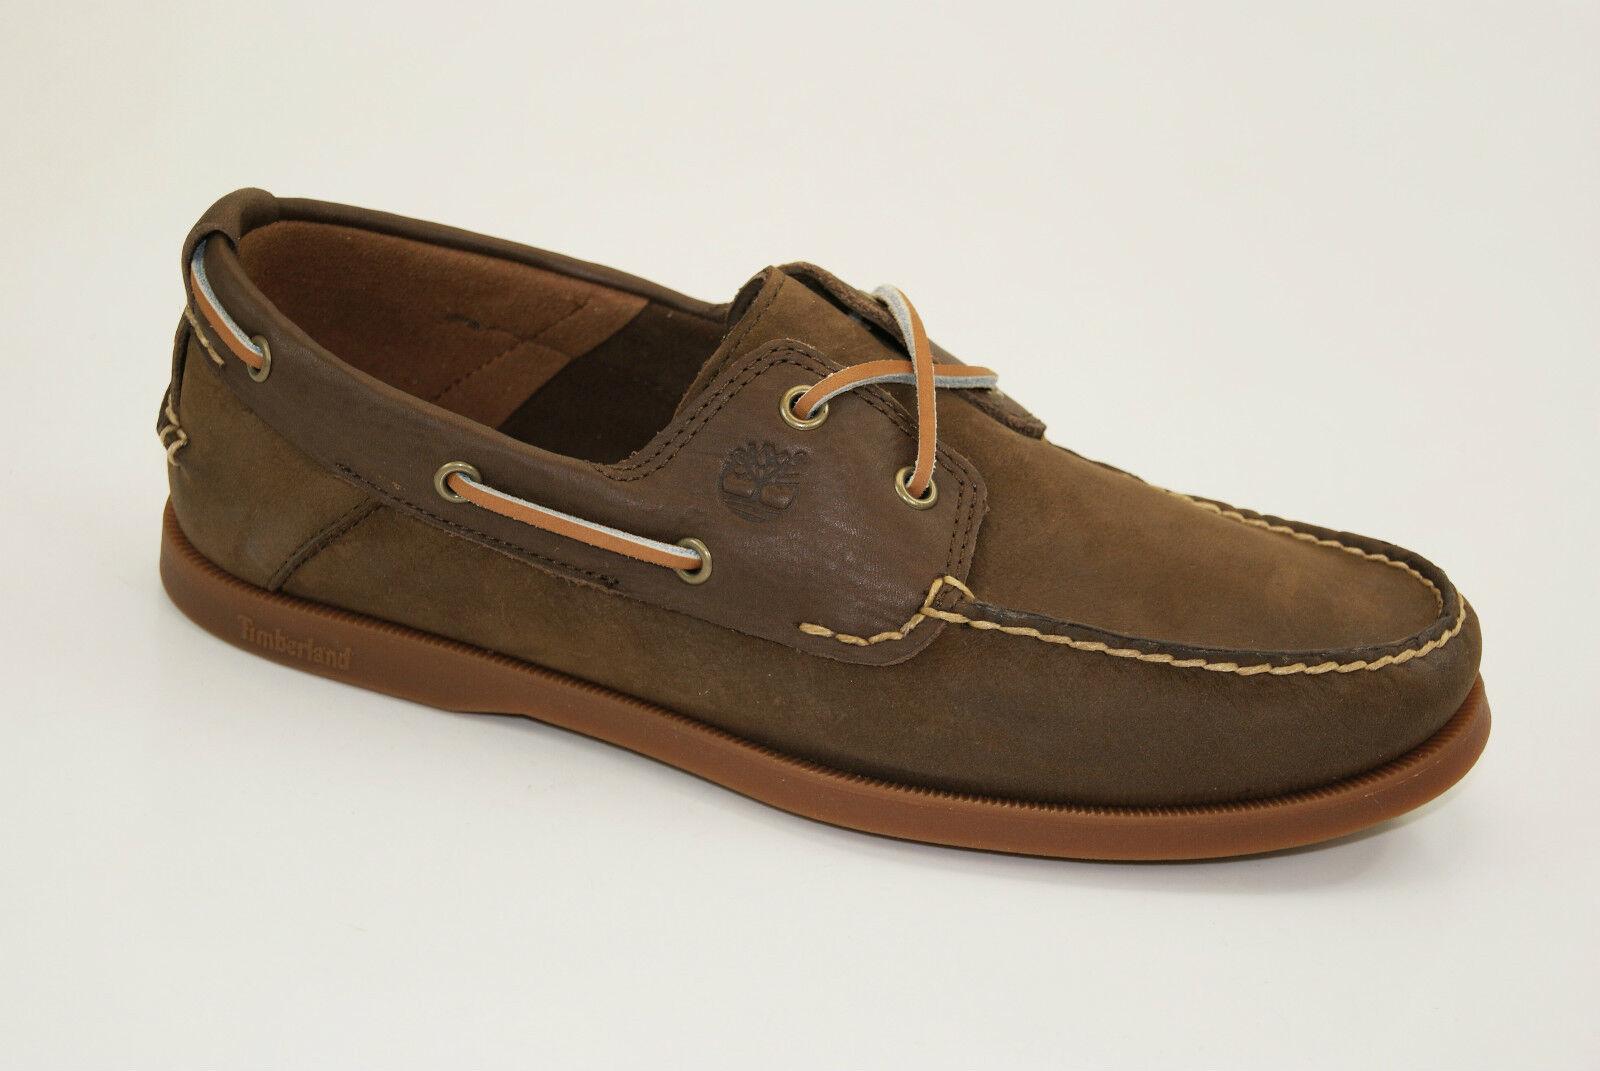 Timberland Heritage 2-eye boat scarpe scarpe scarpe da vela barca scarpe  scarpe scarpe uomo 6306a 79395e 9bc4adb6e96